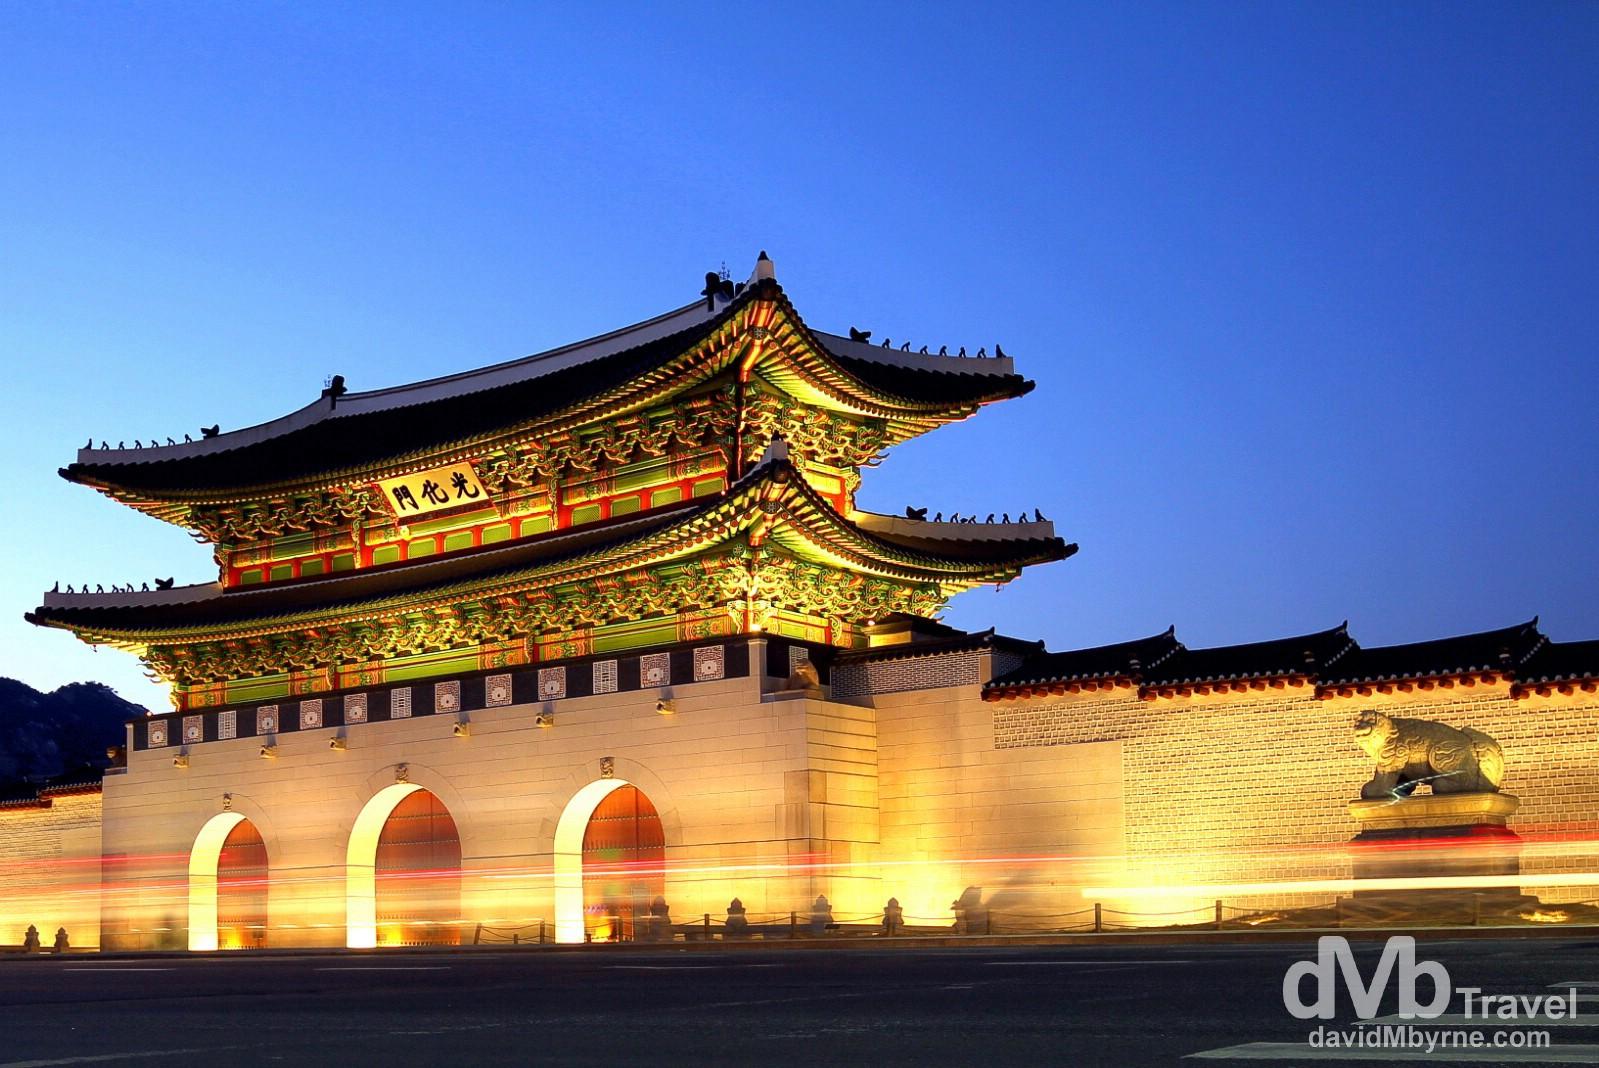 gwanghwamun gate seoul south korea worldwide destination photography insights. Black Bedroom Furniture Sets. Home Design Ideas